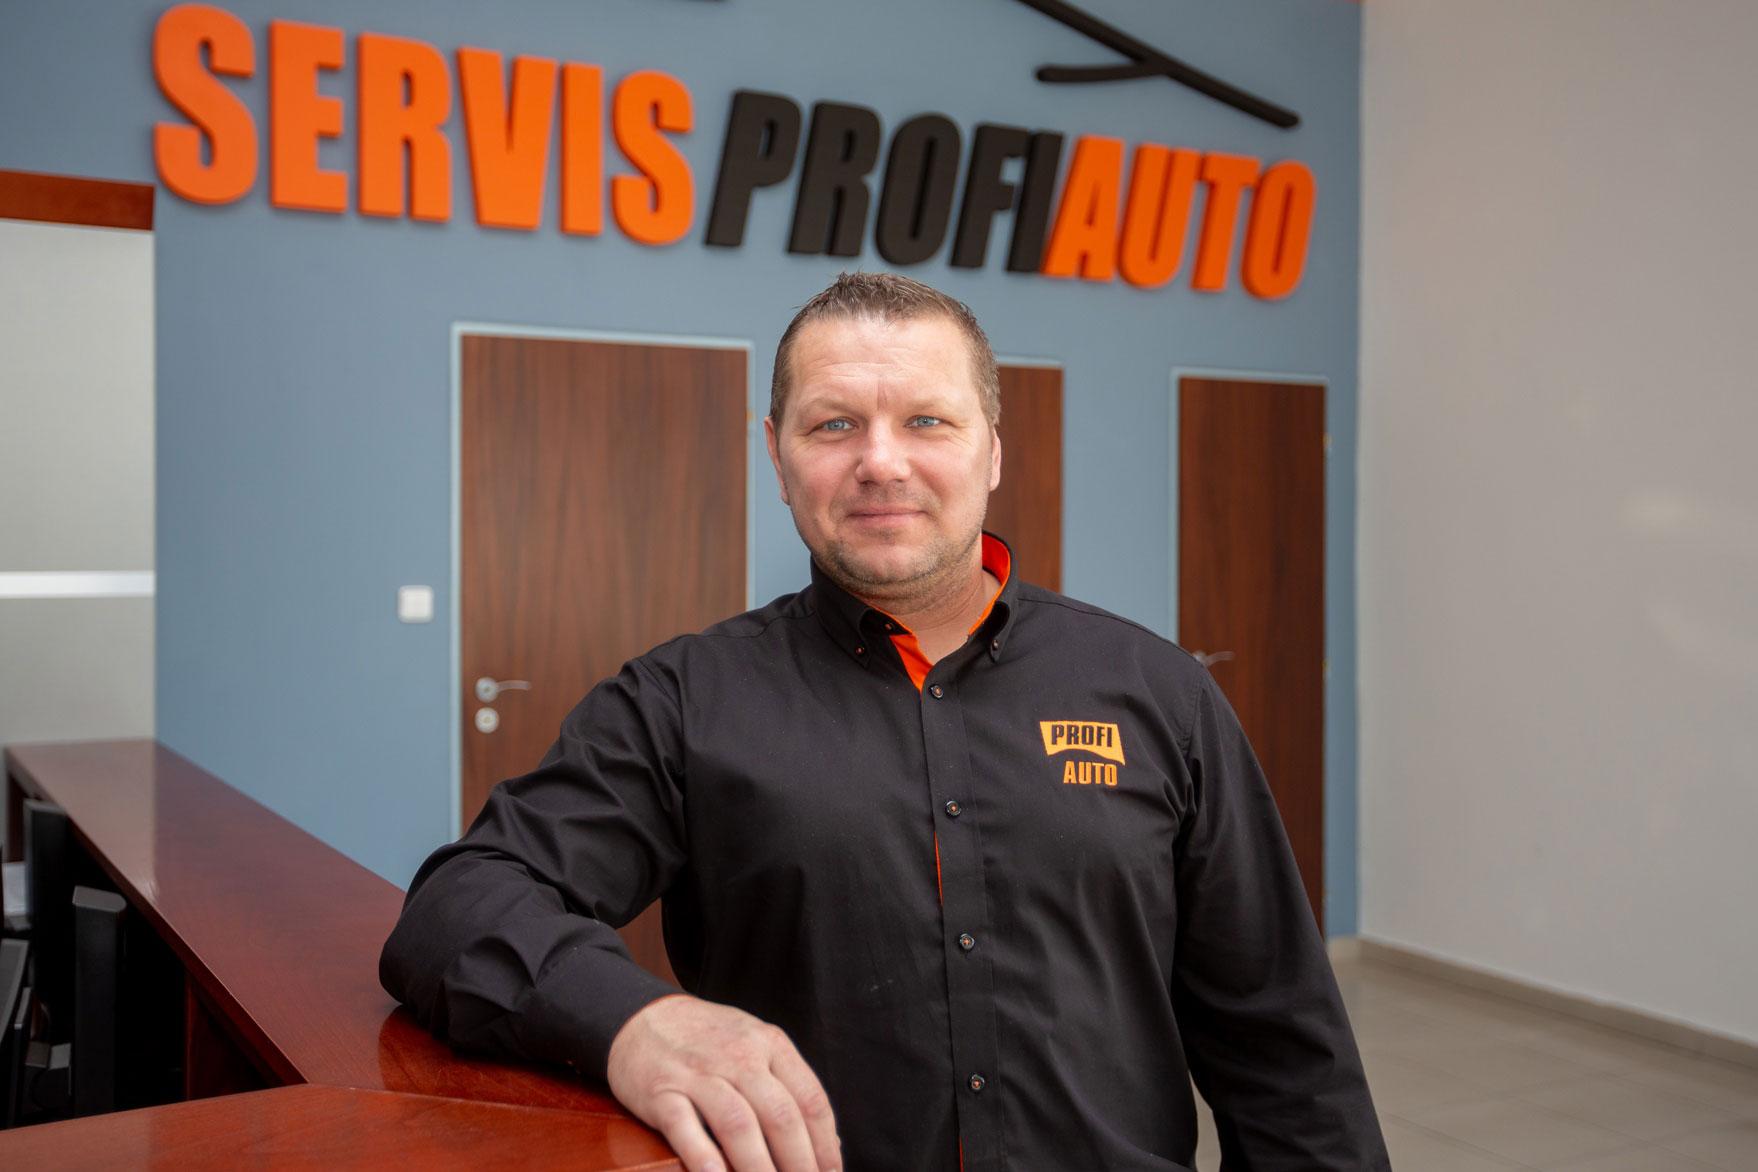 ProfiAuto Servis